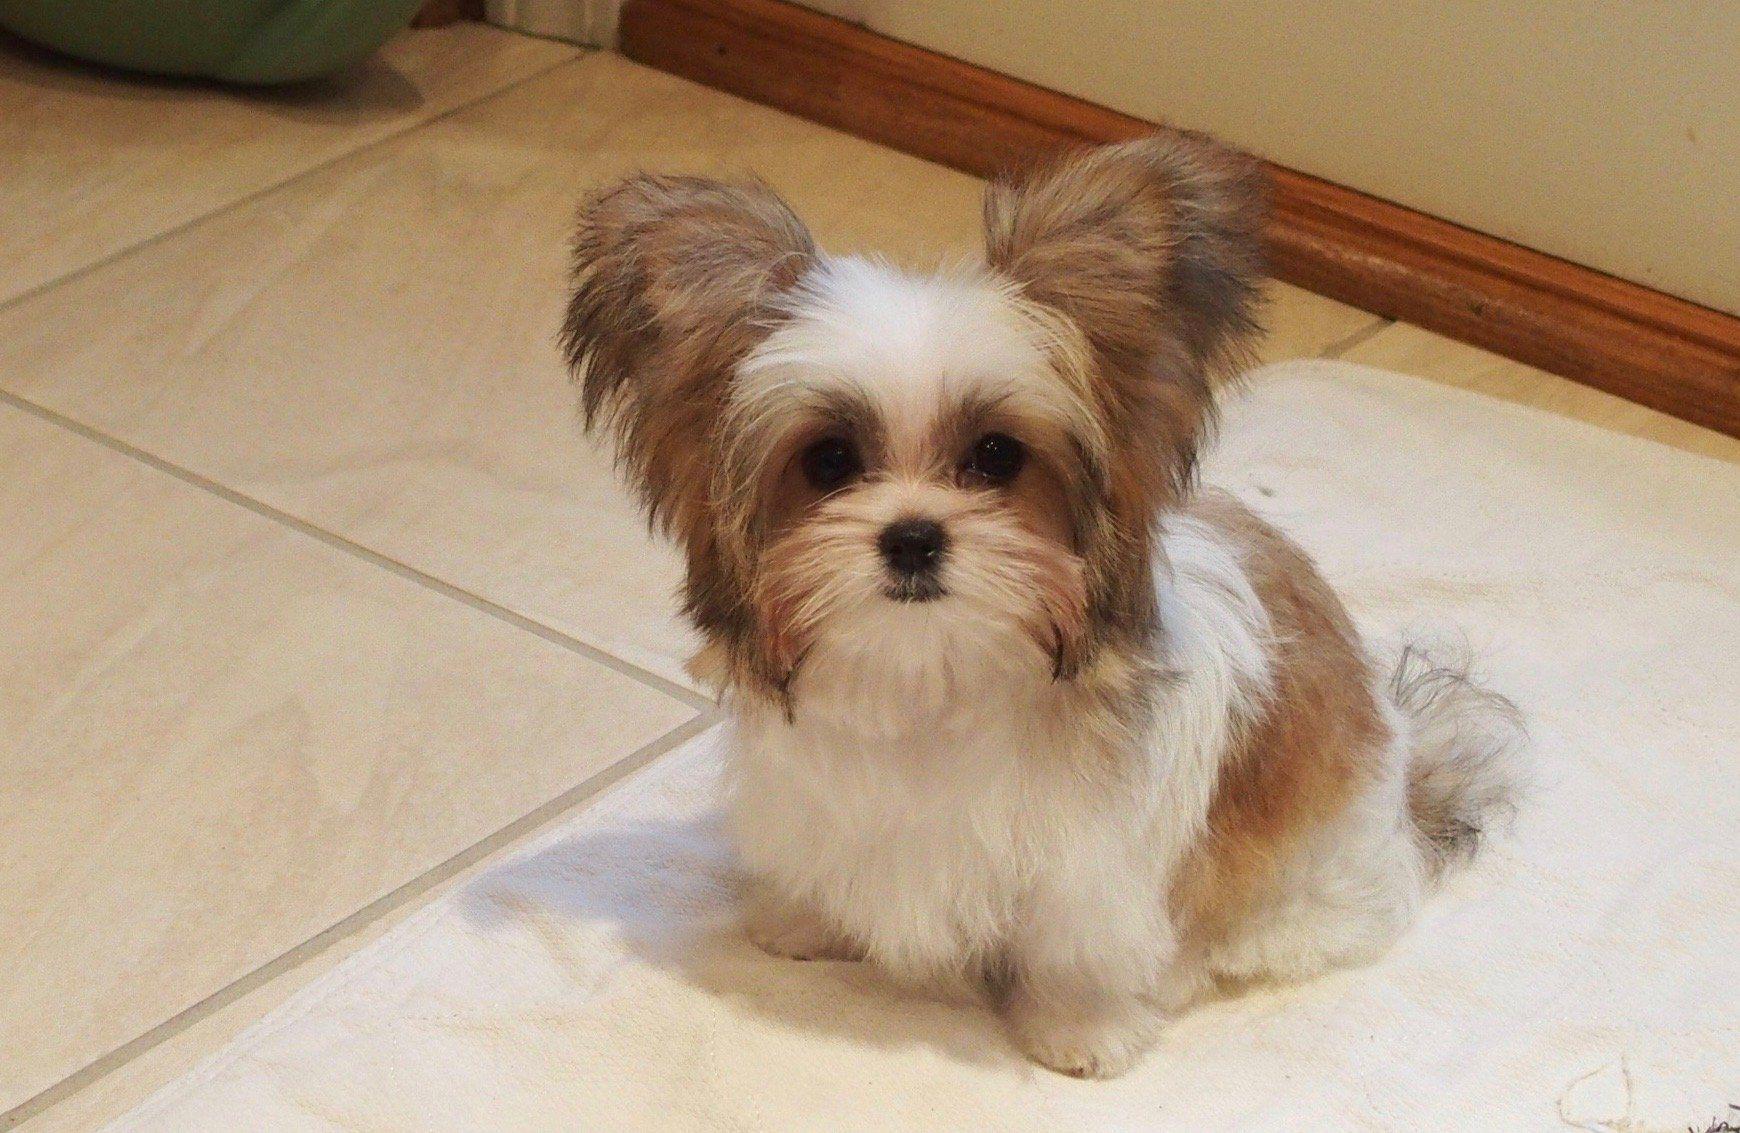 miki photos Google Search Miki dog, Dog breeders near